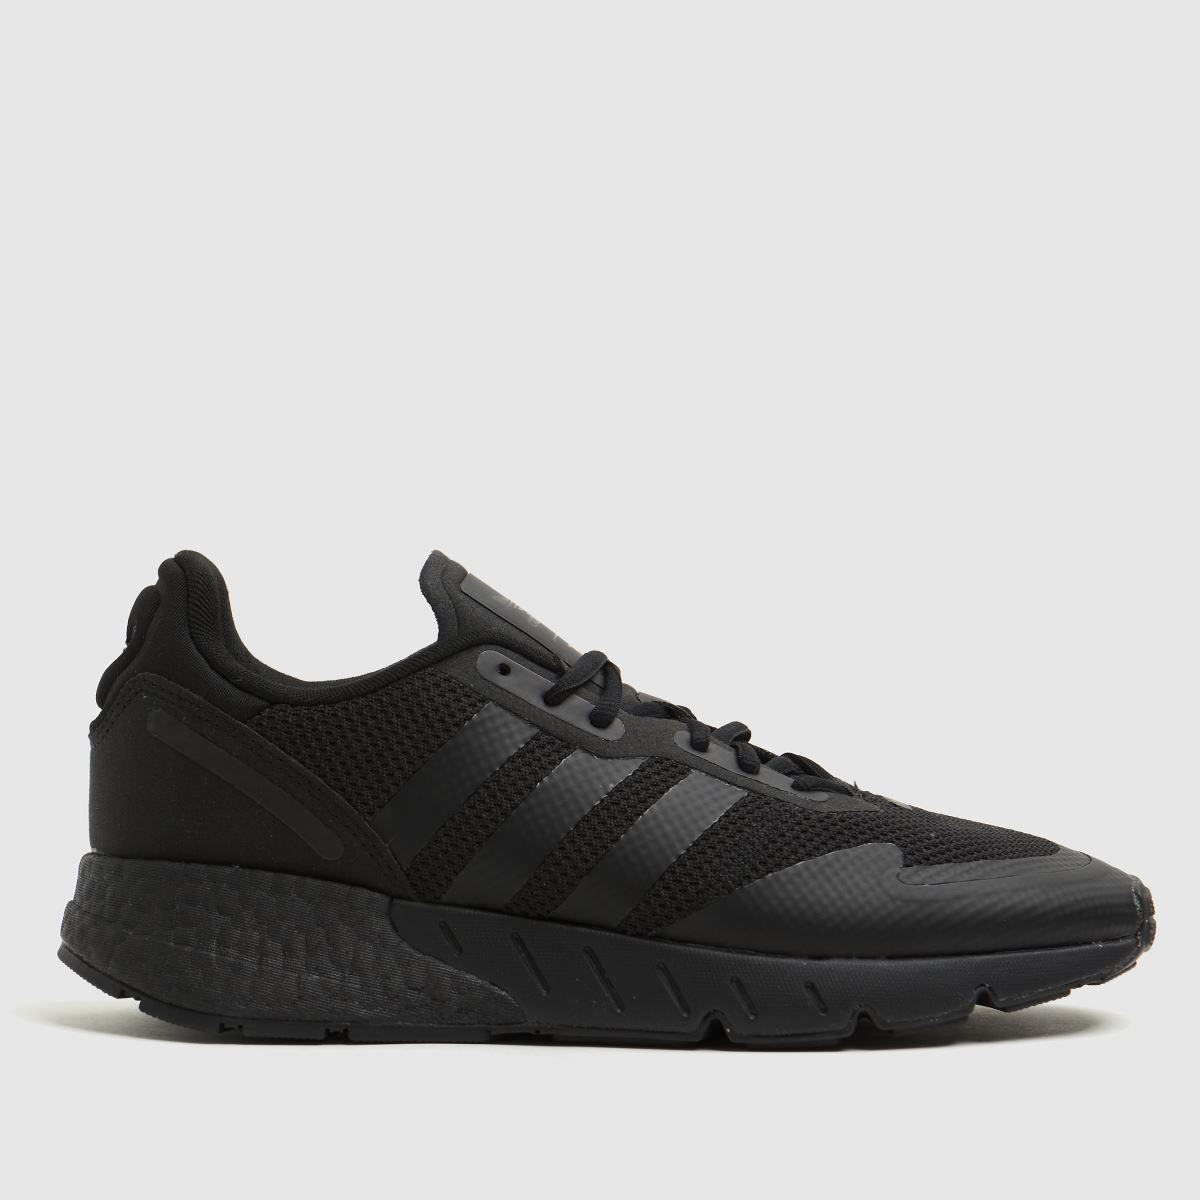 Adidas Black Zx 1k Boost Trainers